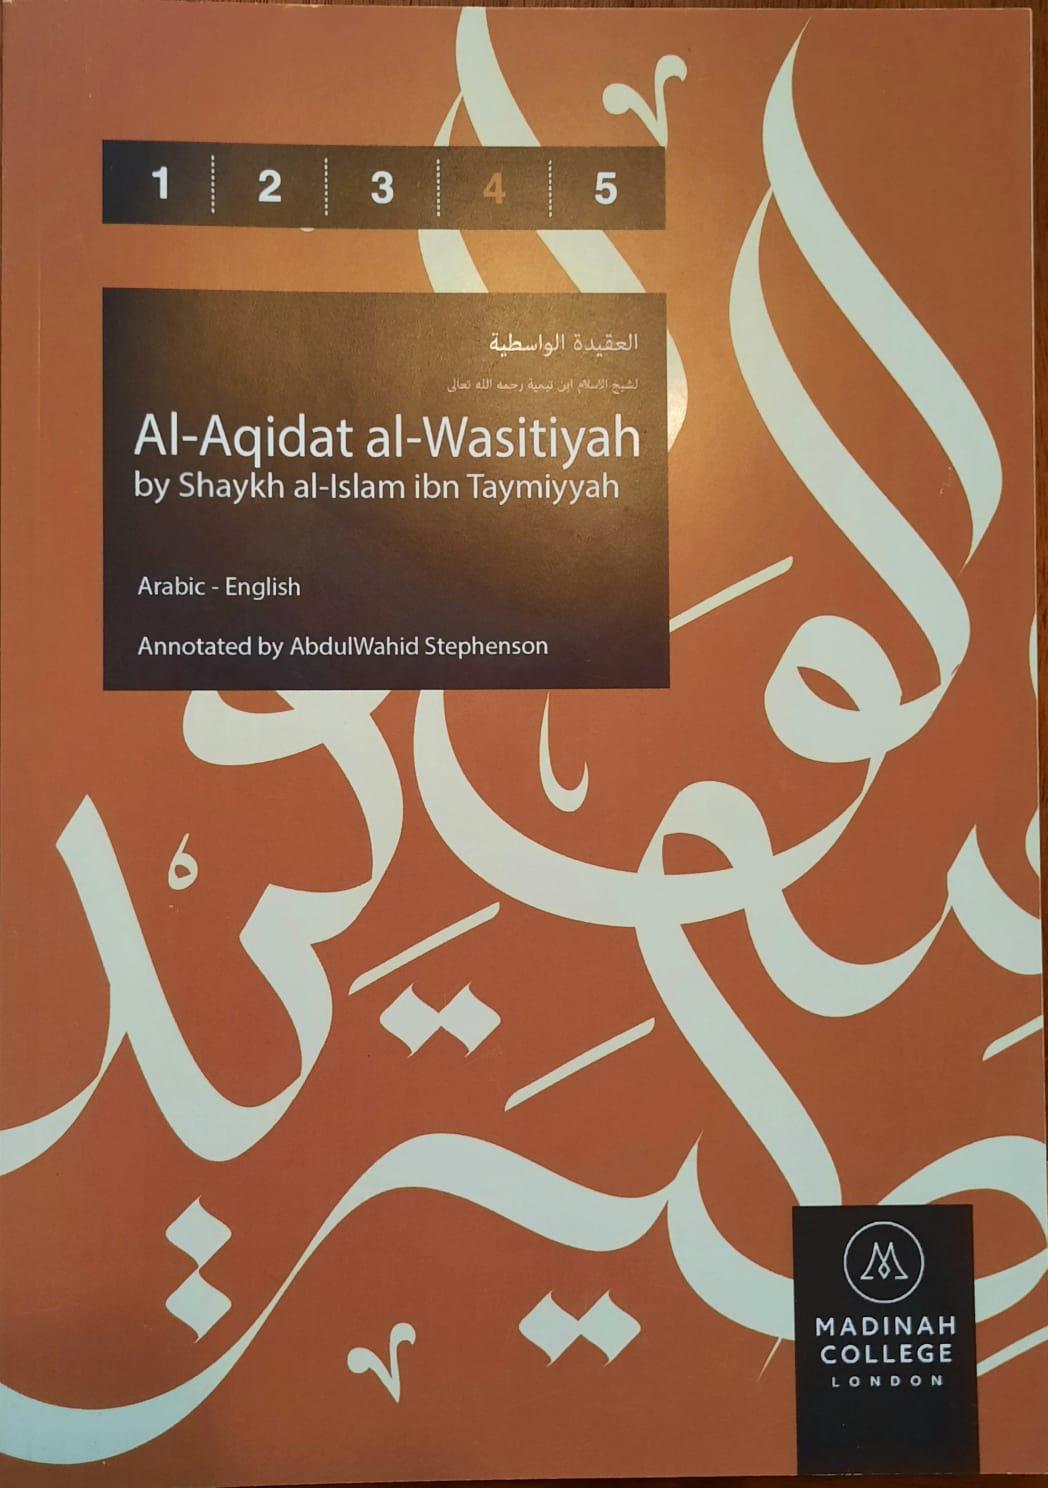 Image of al-Aqidah al-Wasitiyyah - Shaykh ul-Islam Ibn Taymiyyah (728H)